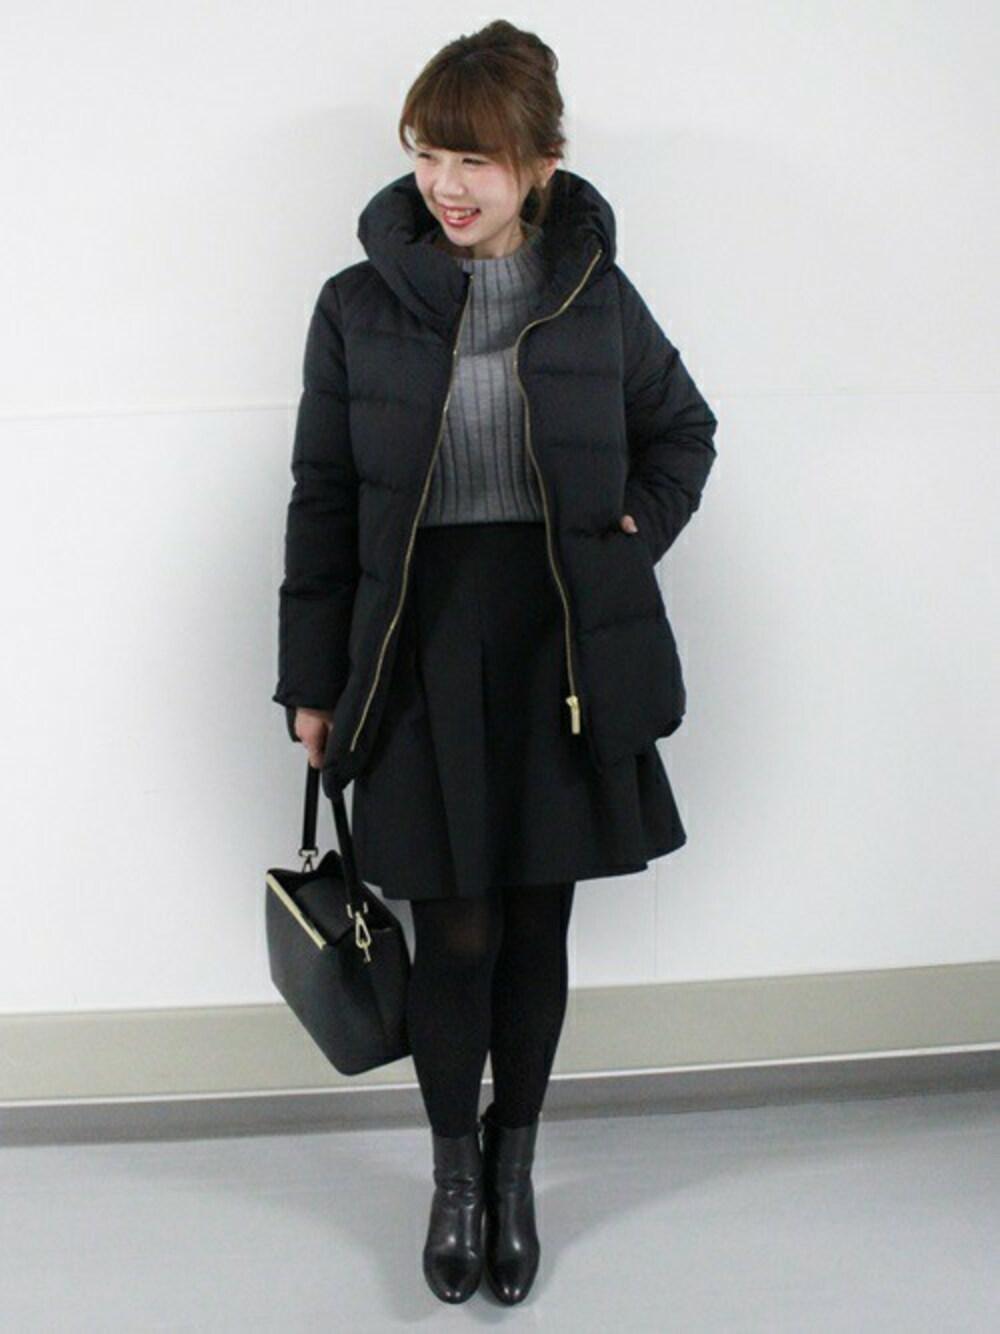 出典:http://wear.jp/noble294x4/8482297/